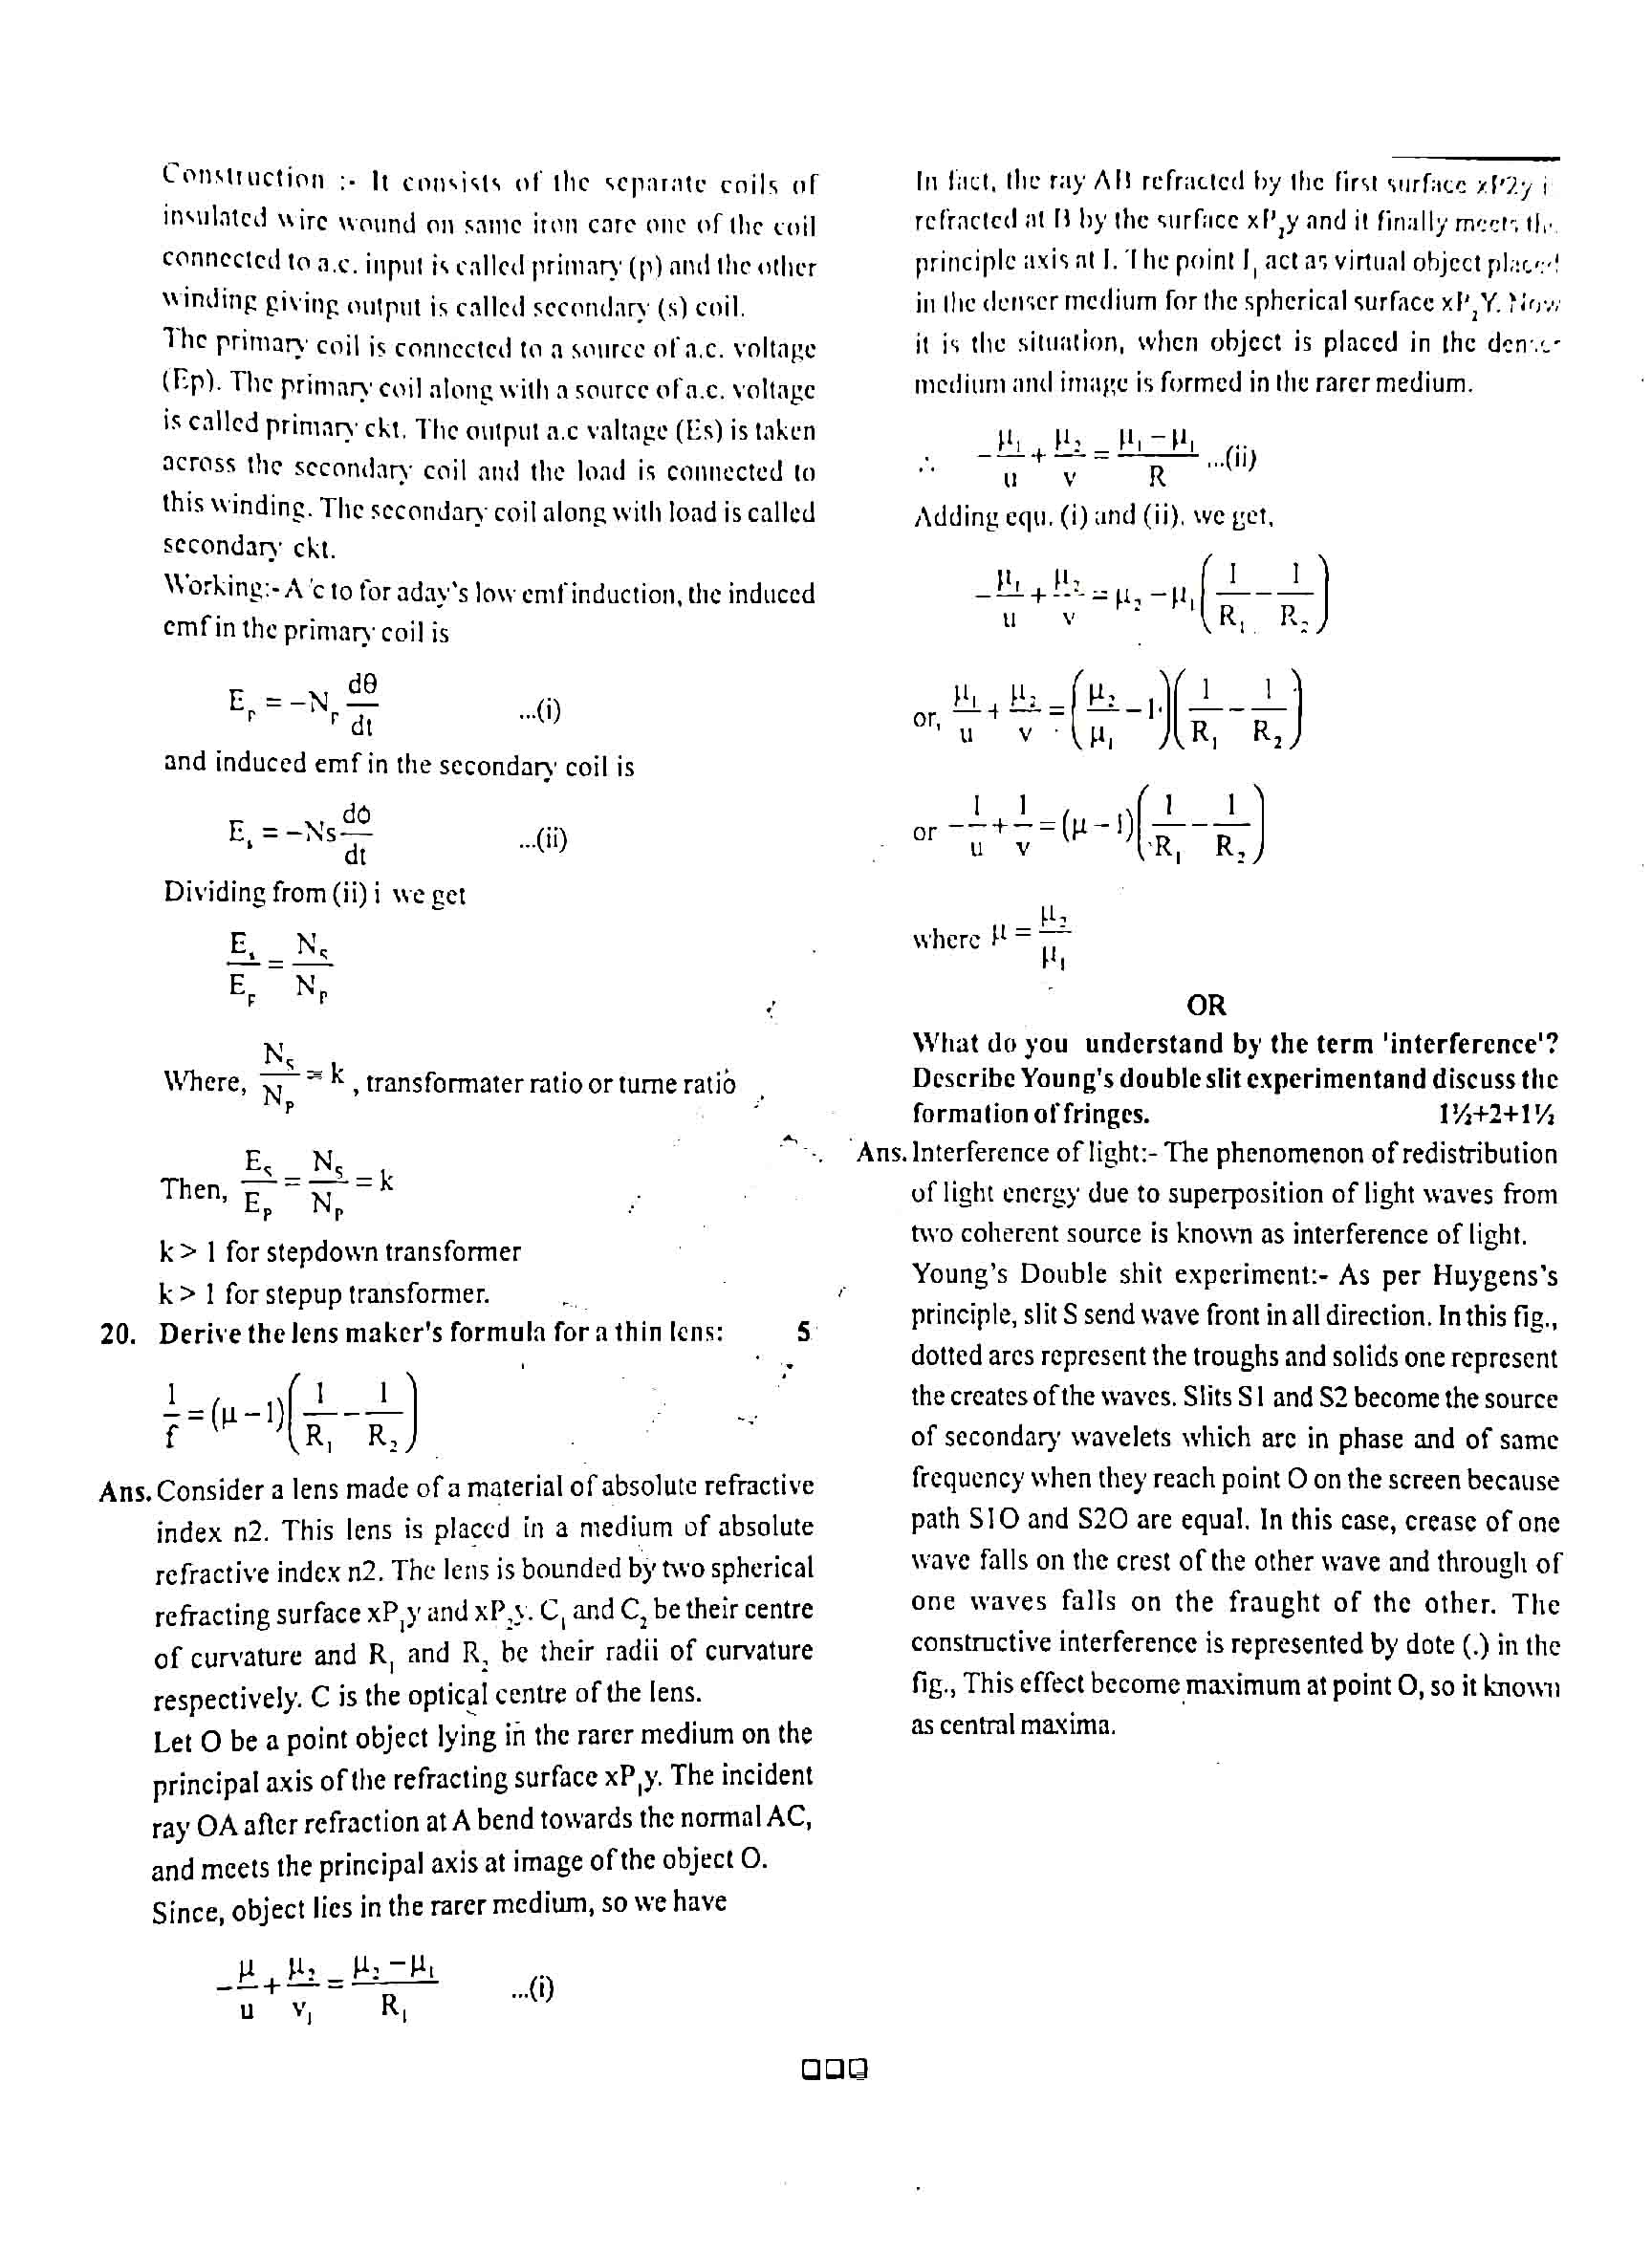 JAC Class 12 Physics 2020 Question Paper 07